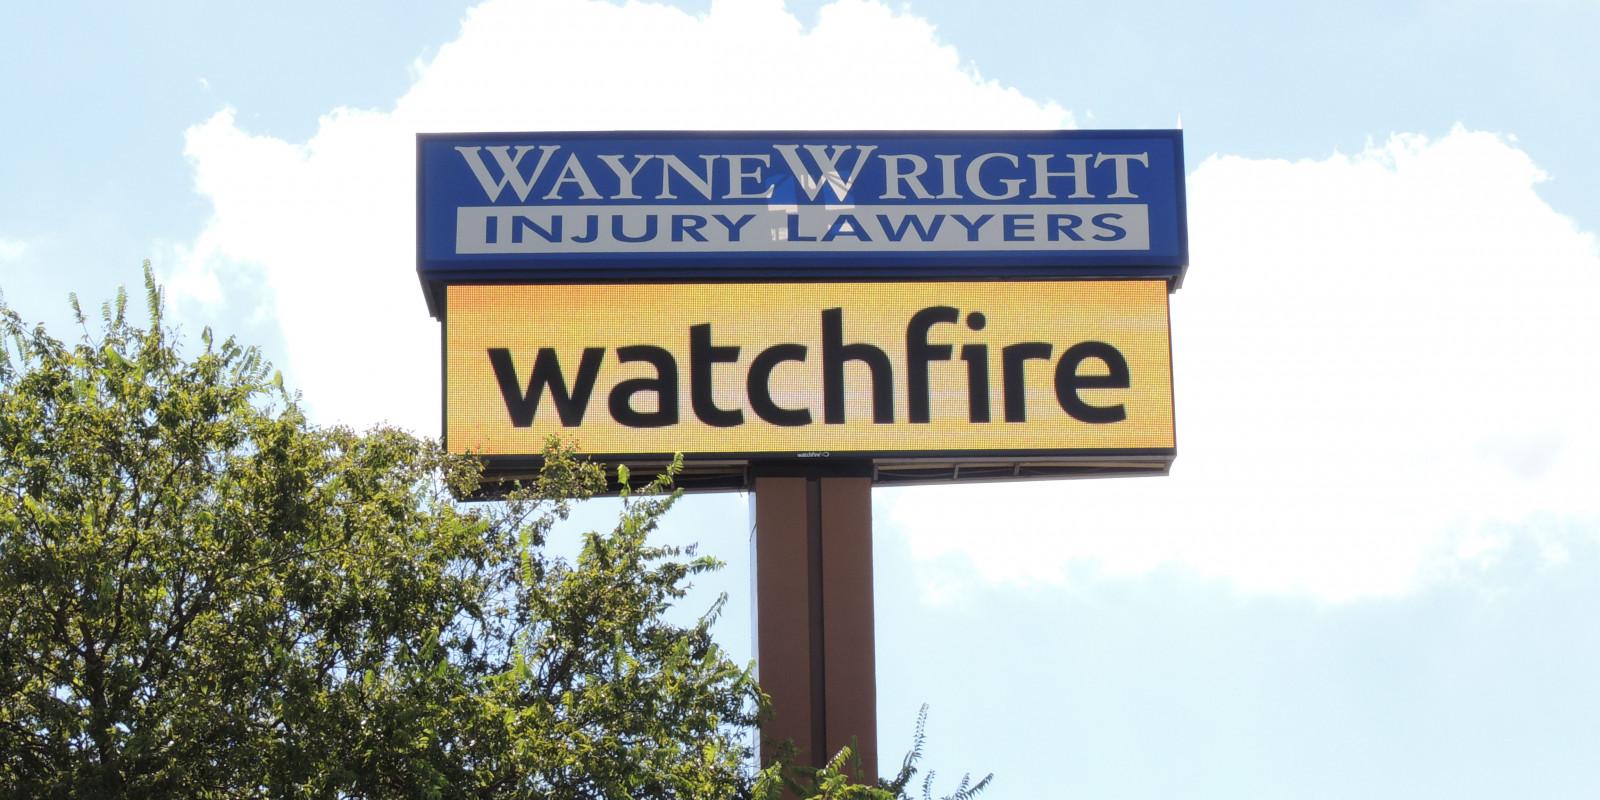 Wayne Wright Injury Laywers